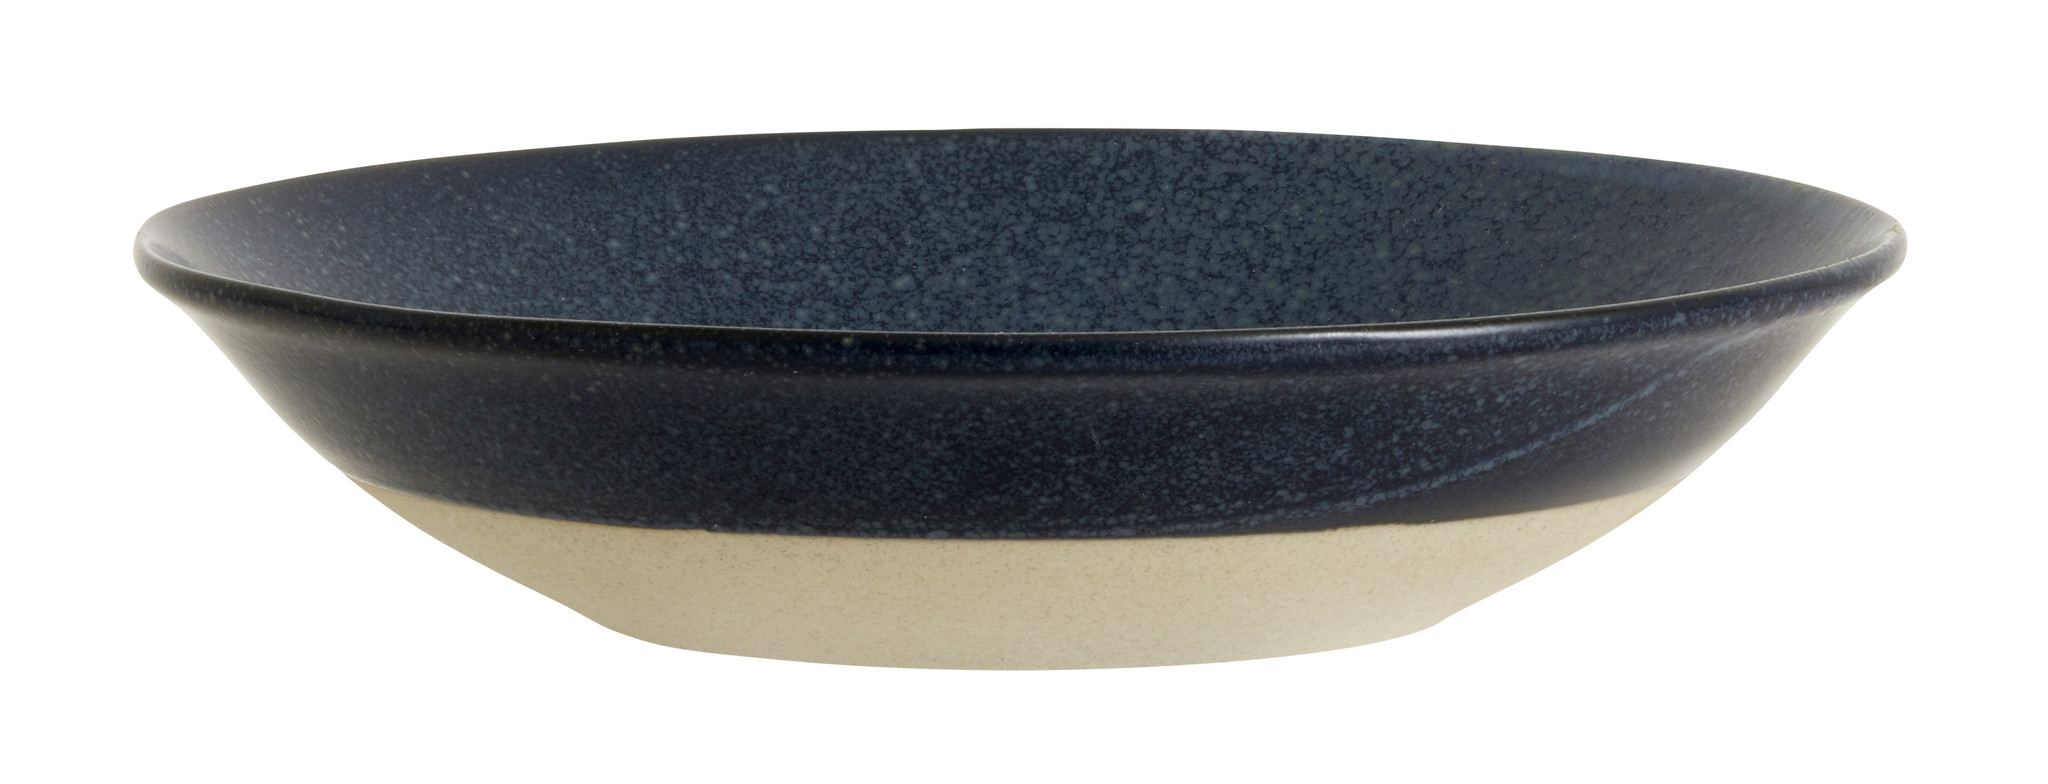 Nordal Grainy diep bord ø 22,5 cm - donkerblauw- 57009-5708309157412